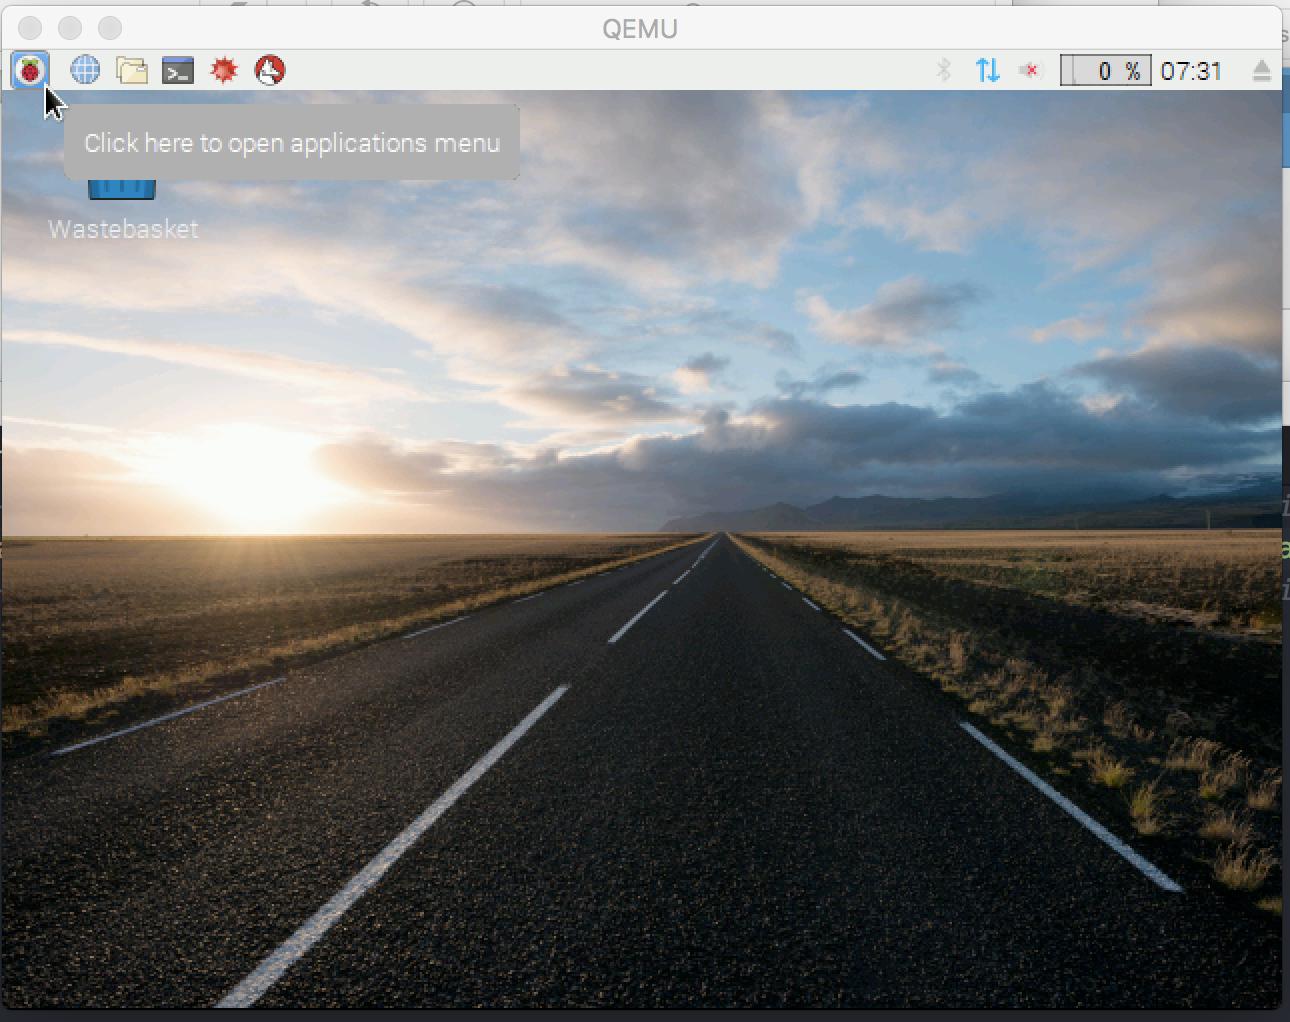 Using QEMU to Emulate Raspberry Pi to Learn Assembler